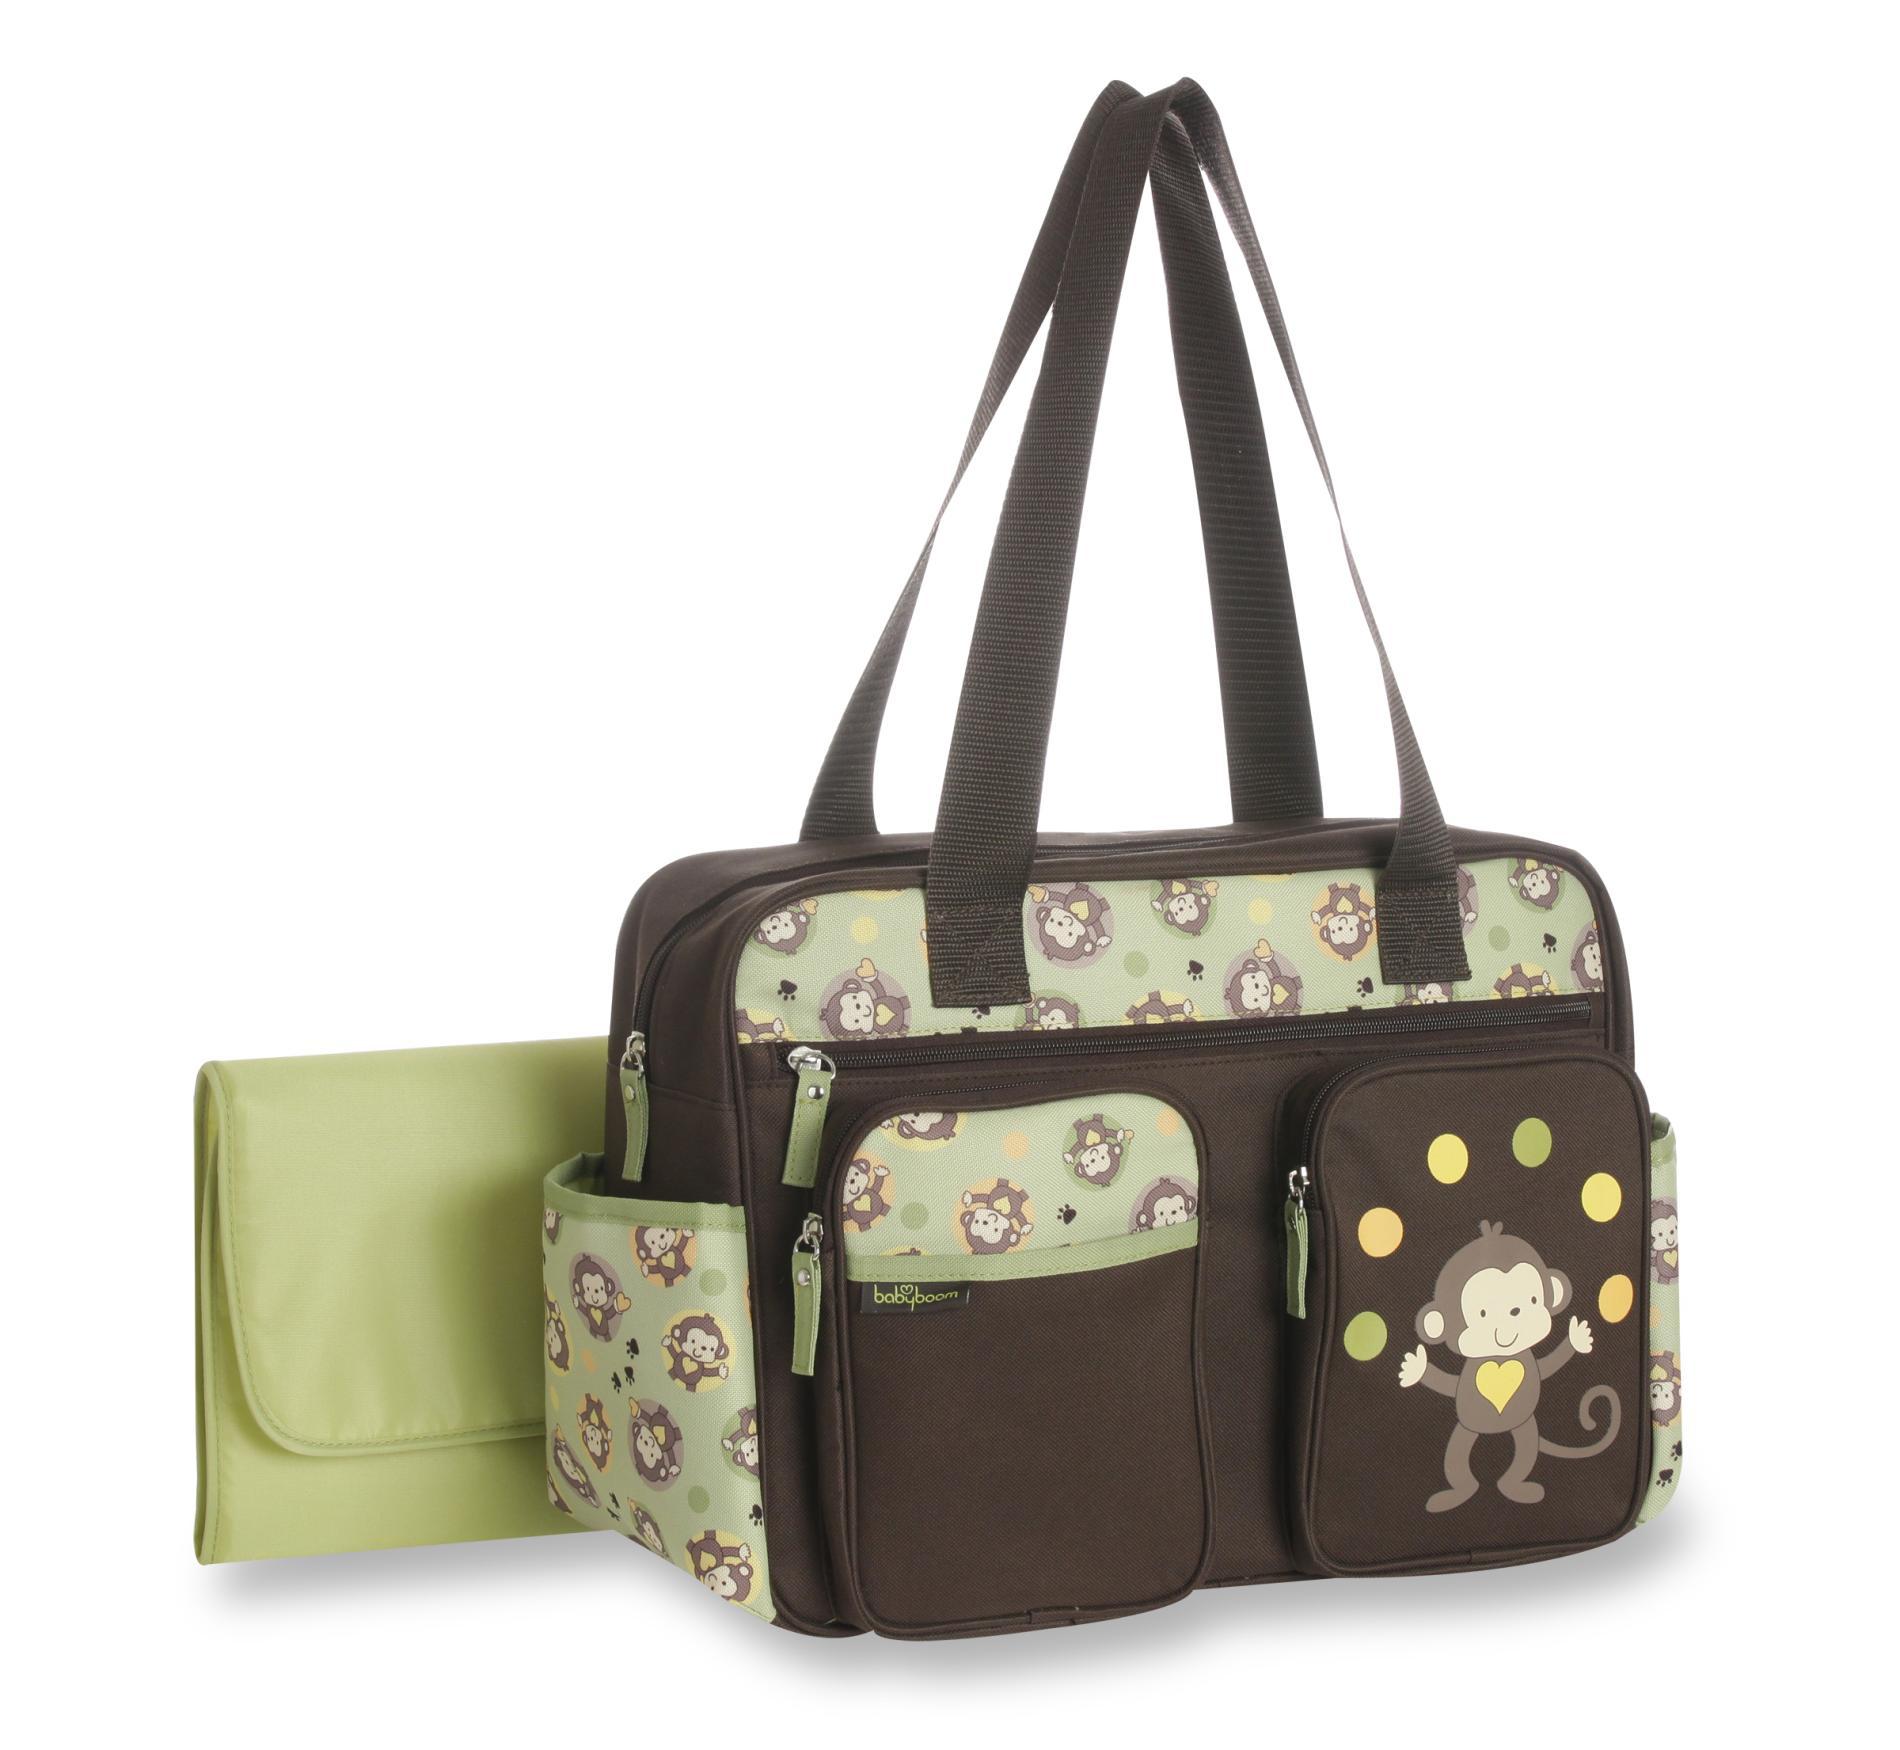 Baby Boom Diaper Bag & Changing Pad - Monkey